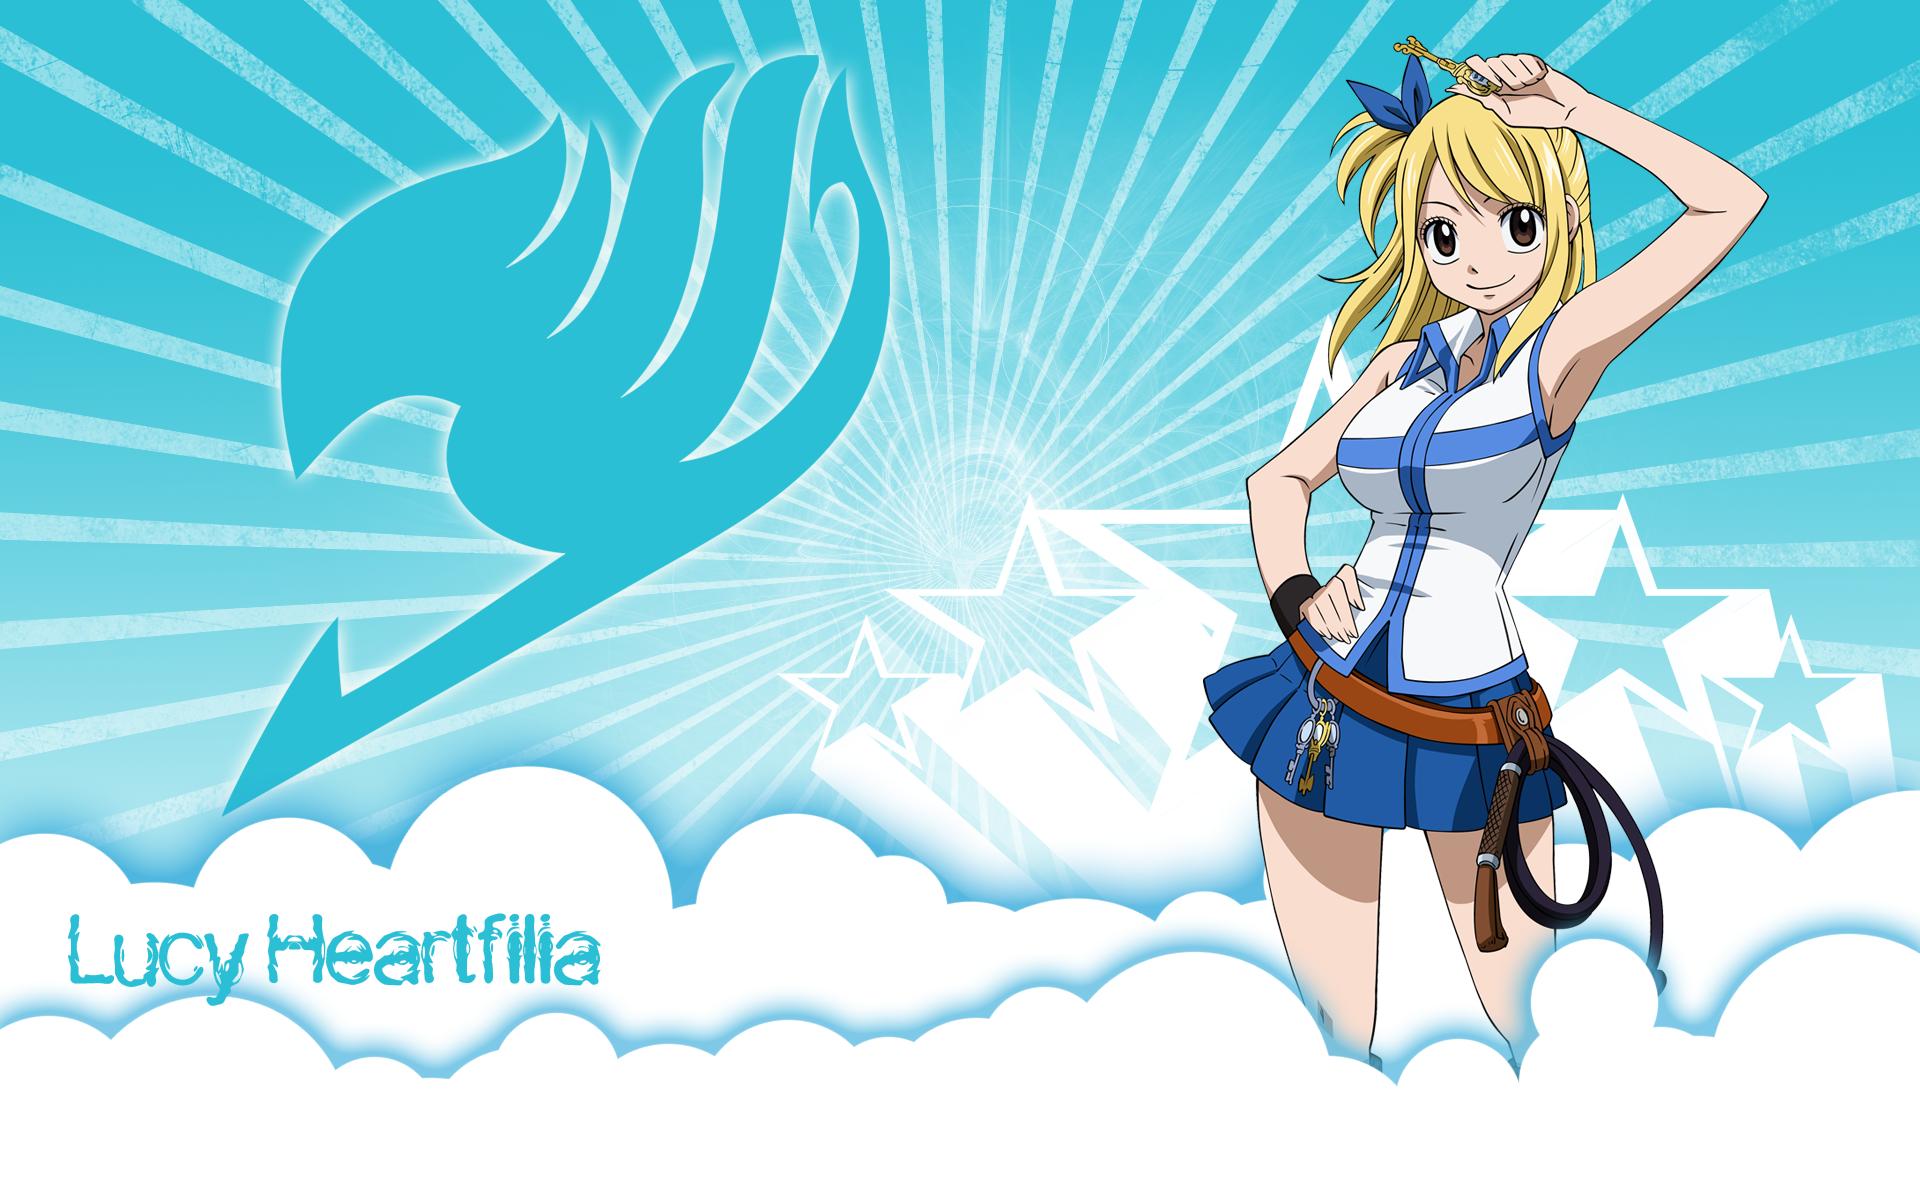 Wallpaper Anime Fairy Tail Heartfilia Lucy 1920x1200